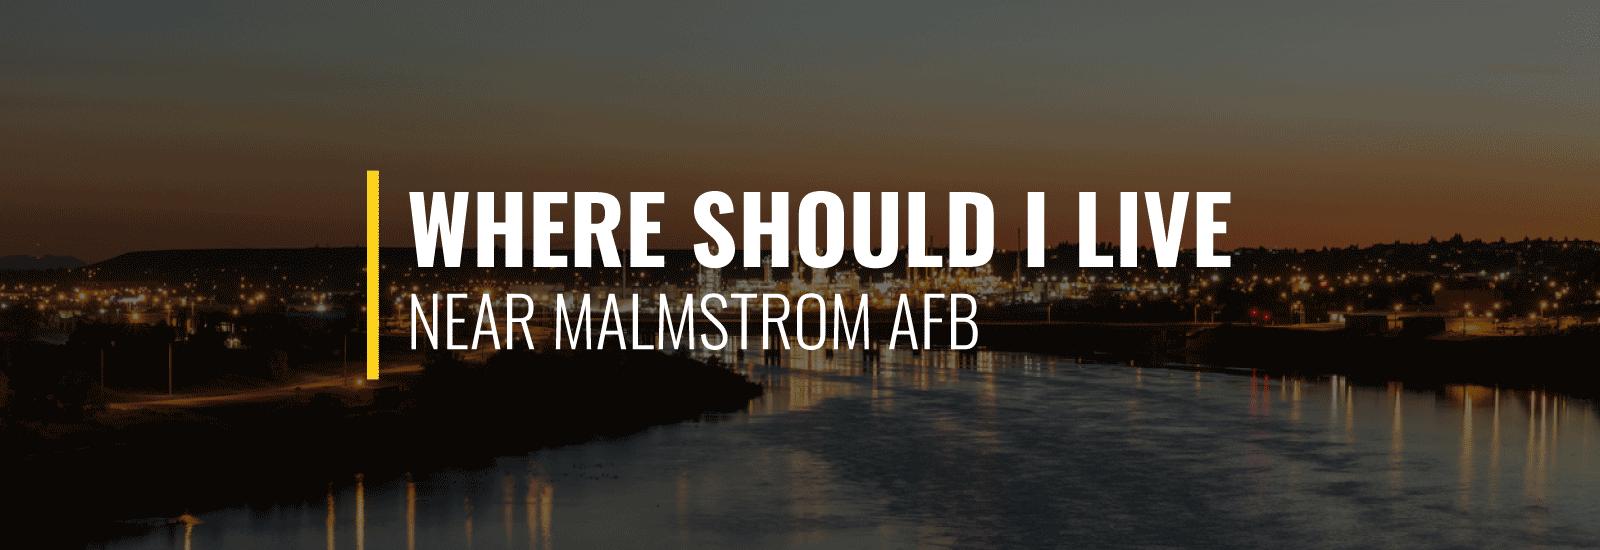 Where To Live Near Malmstrom Air Force Base?